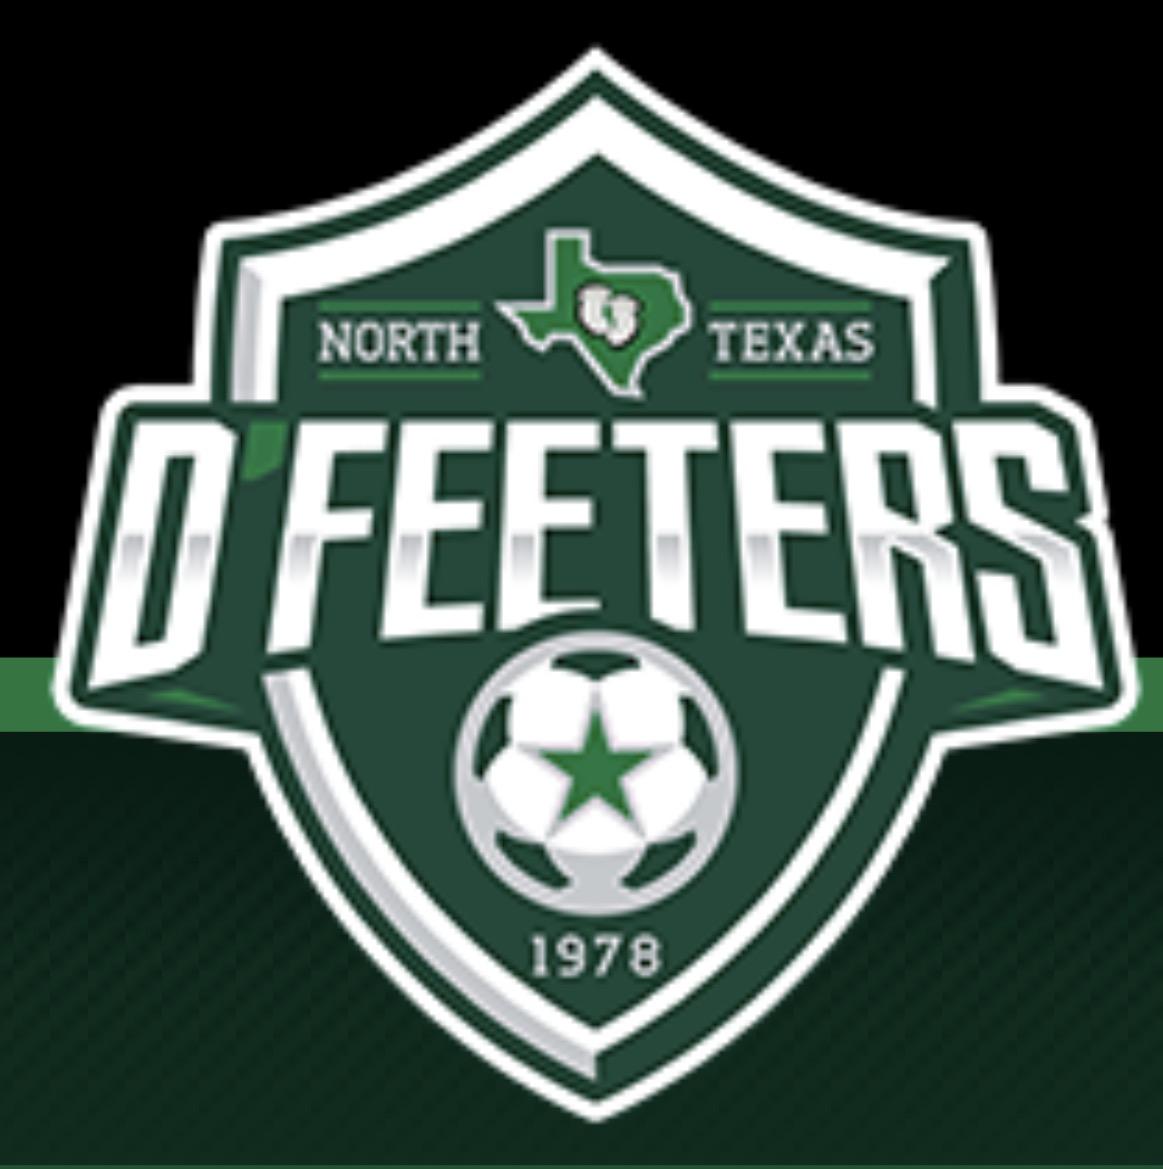 D'Feeters 04 Voutier